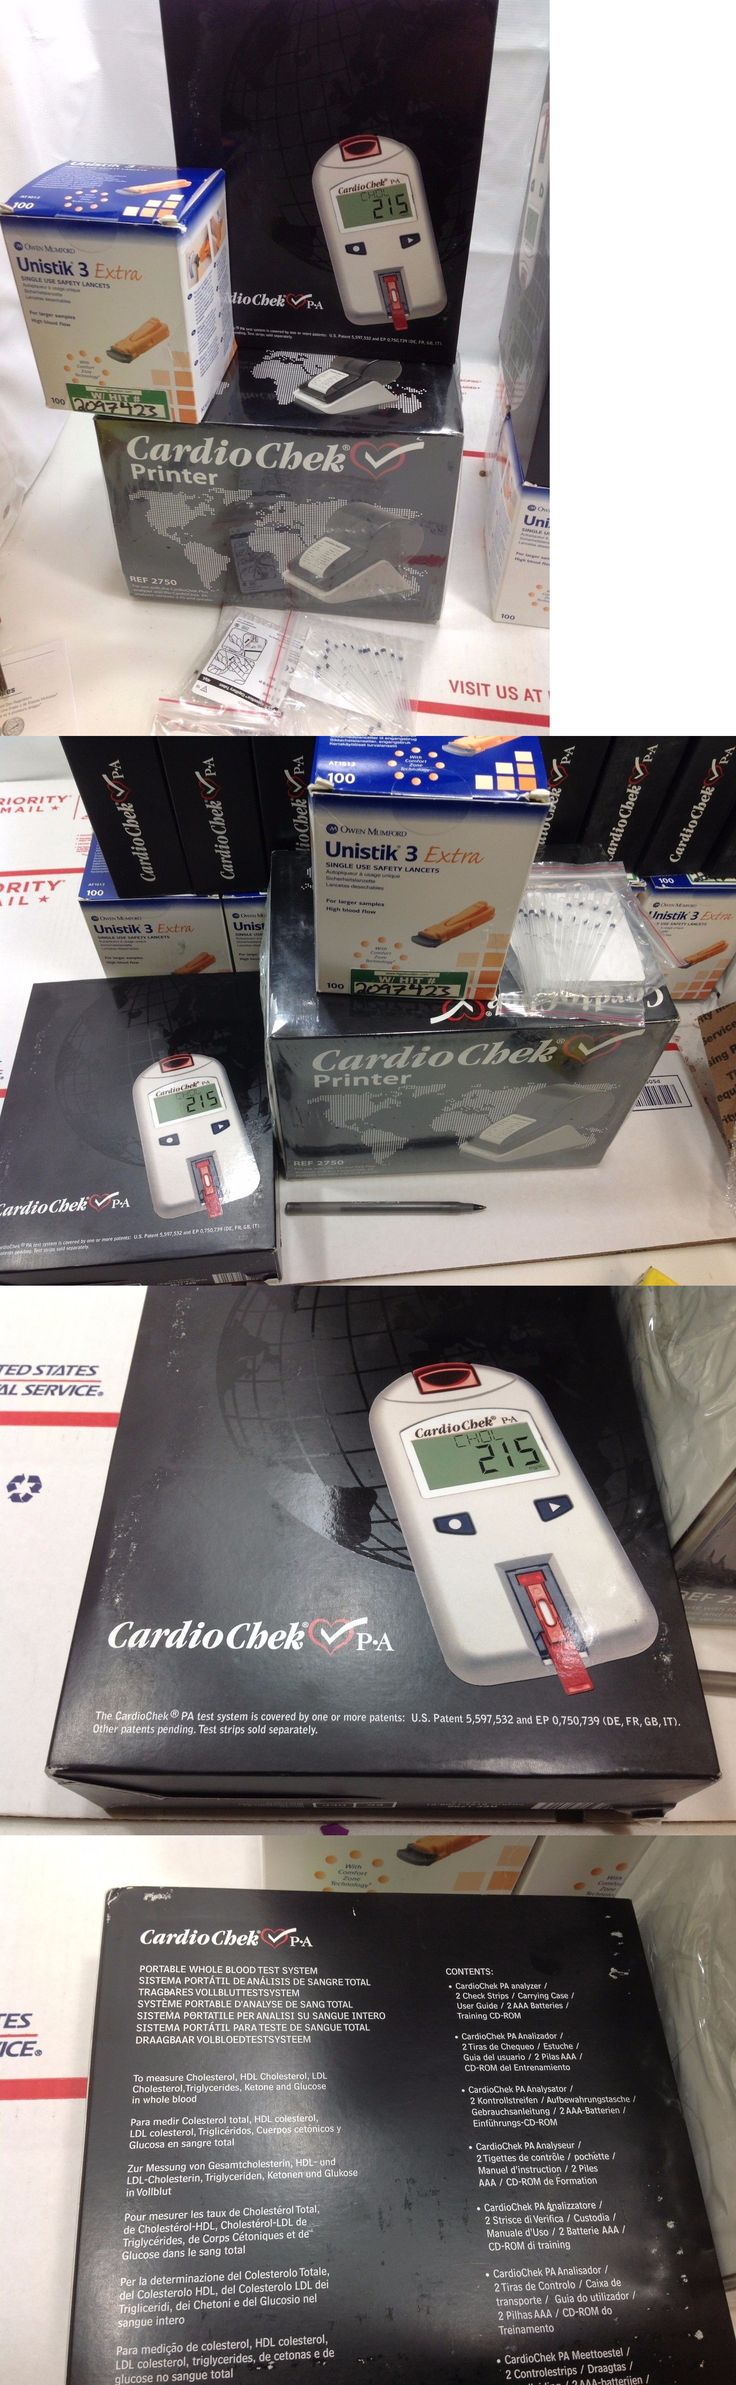 Cholesterol Testing: Complete Cardiochek Pa Analyzer W Printer Unistik Lancets 4 Pk Capillary Tube #2 BUY IT NOW ONLY: $555.0